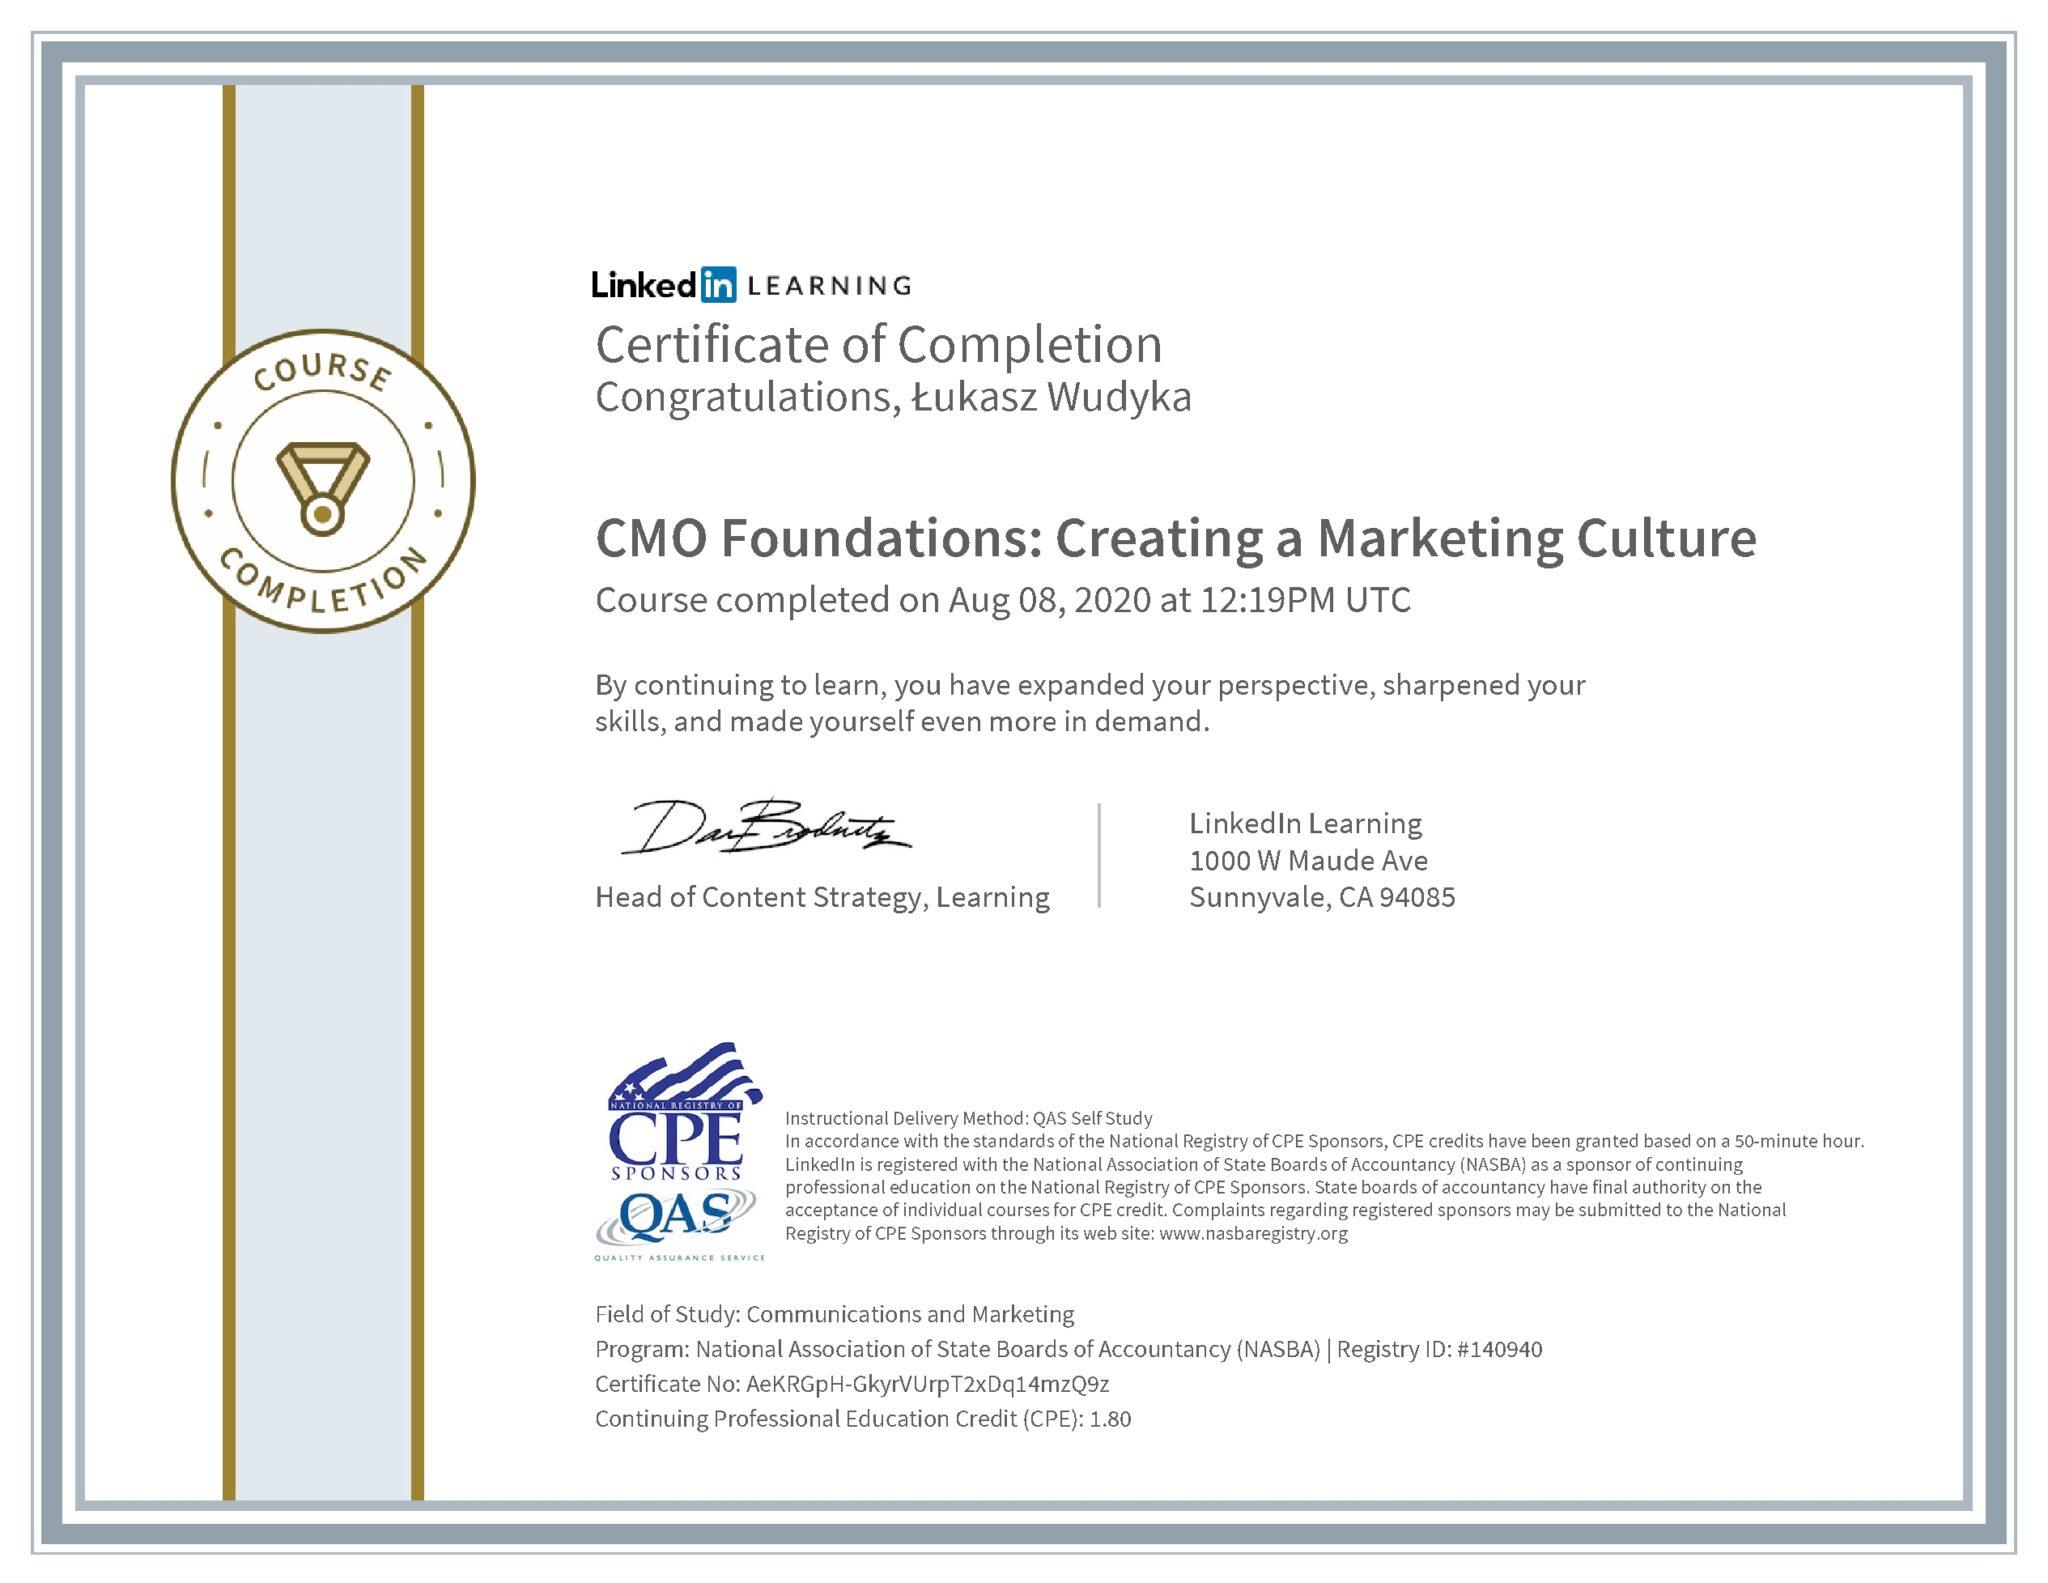 Łukasz Wudyka certyfikat LinkedIn CMO Foundations: Creating a Marketing Culture NASBA